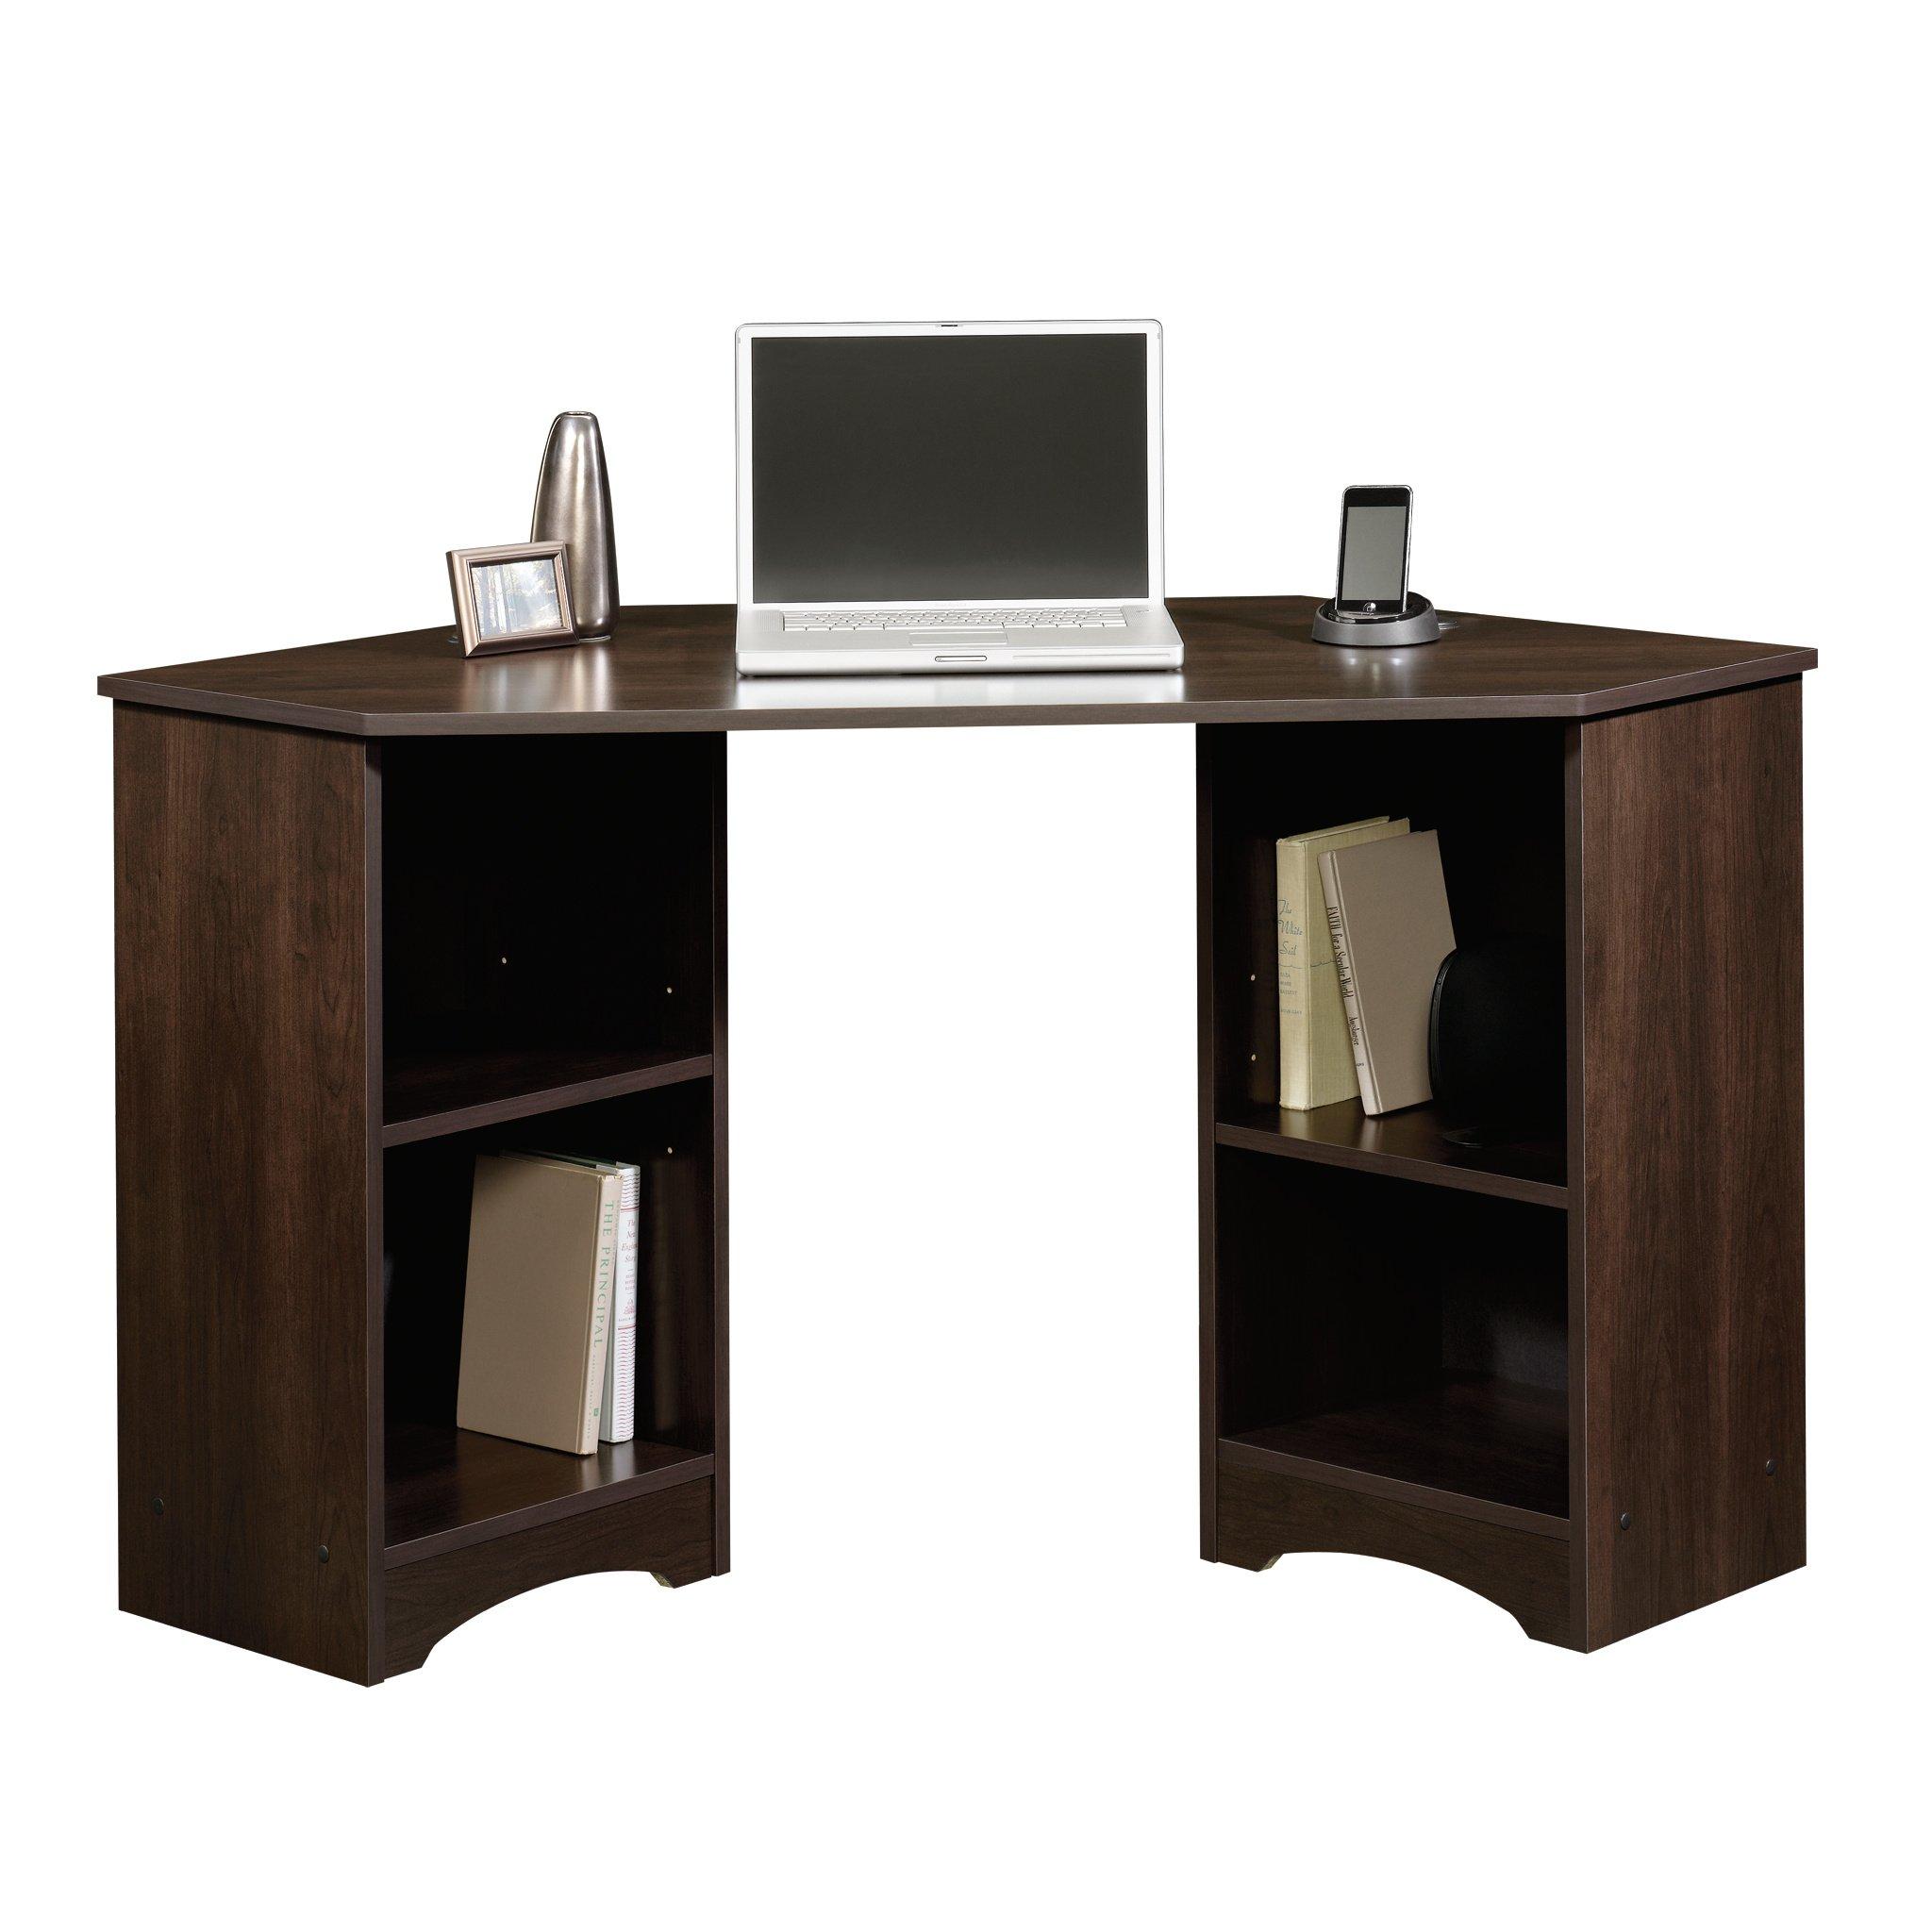 Sauder 413073 Beginnings Corner Desk